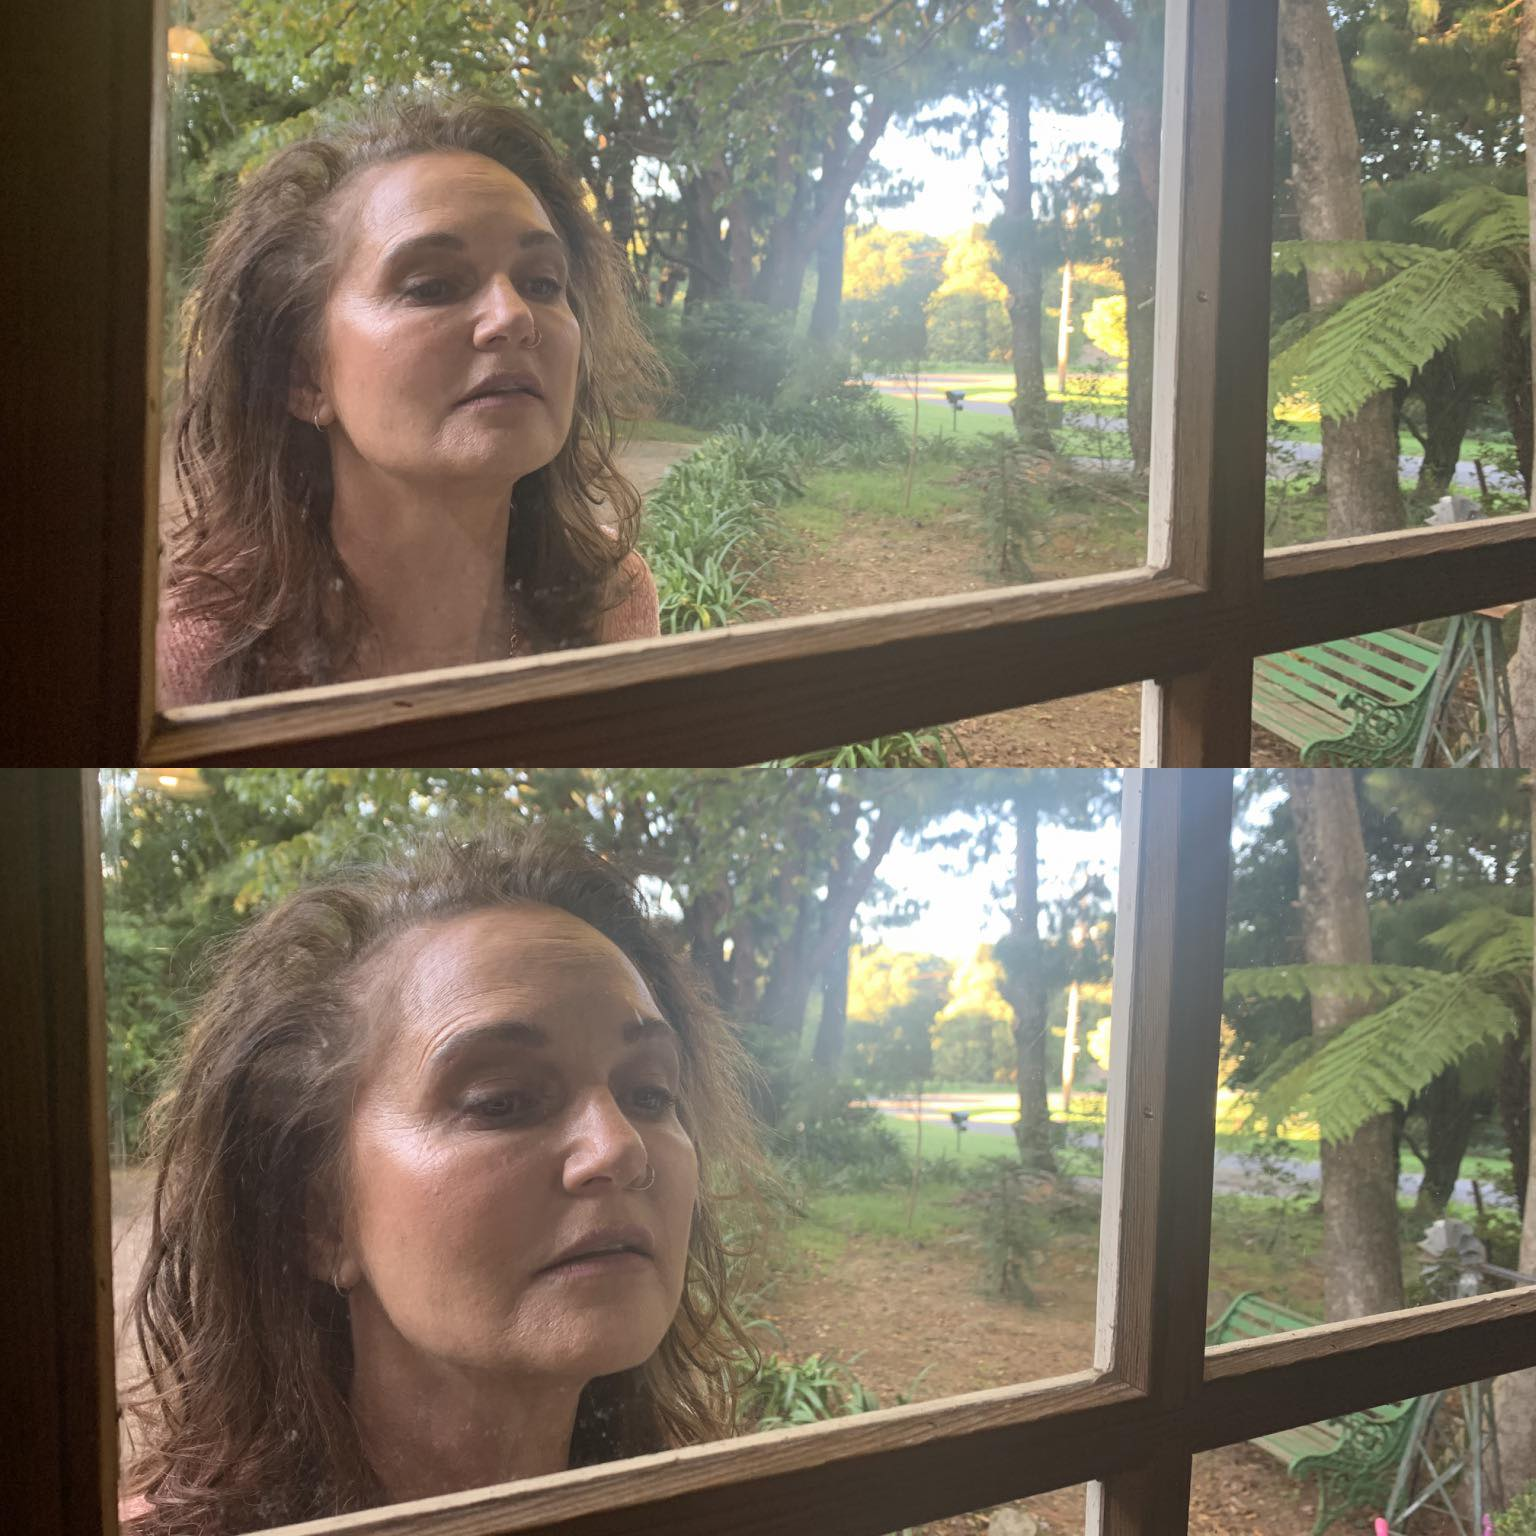 Yaamanda yanay barriyaygu? Will you come to the window? by Jedison Wells